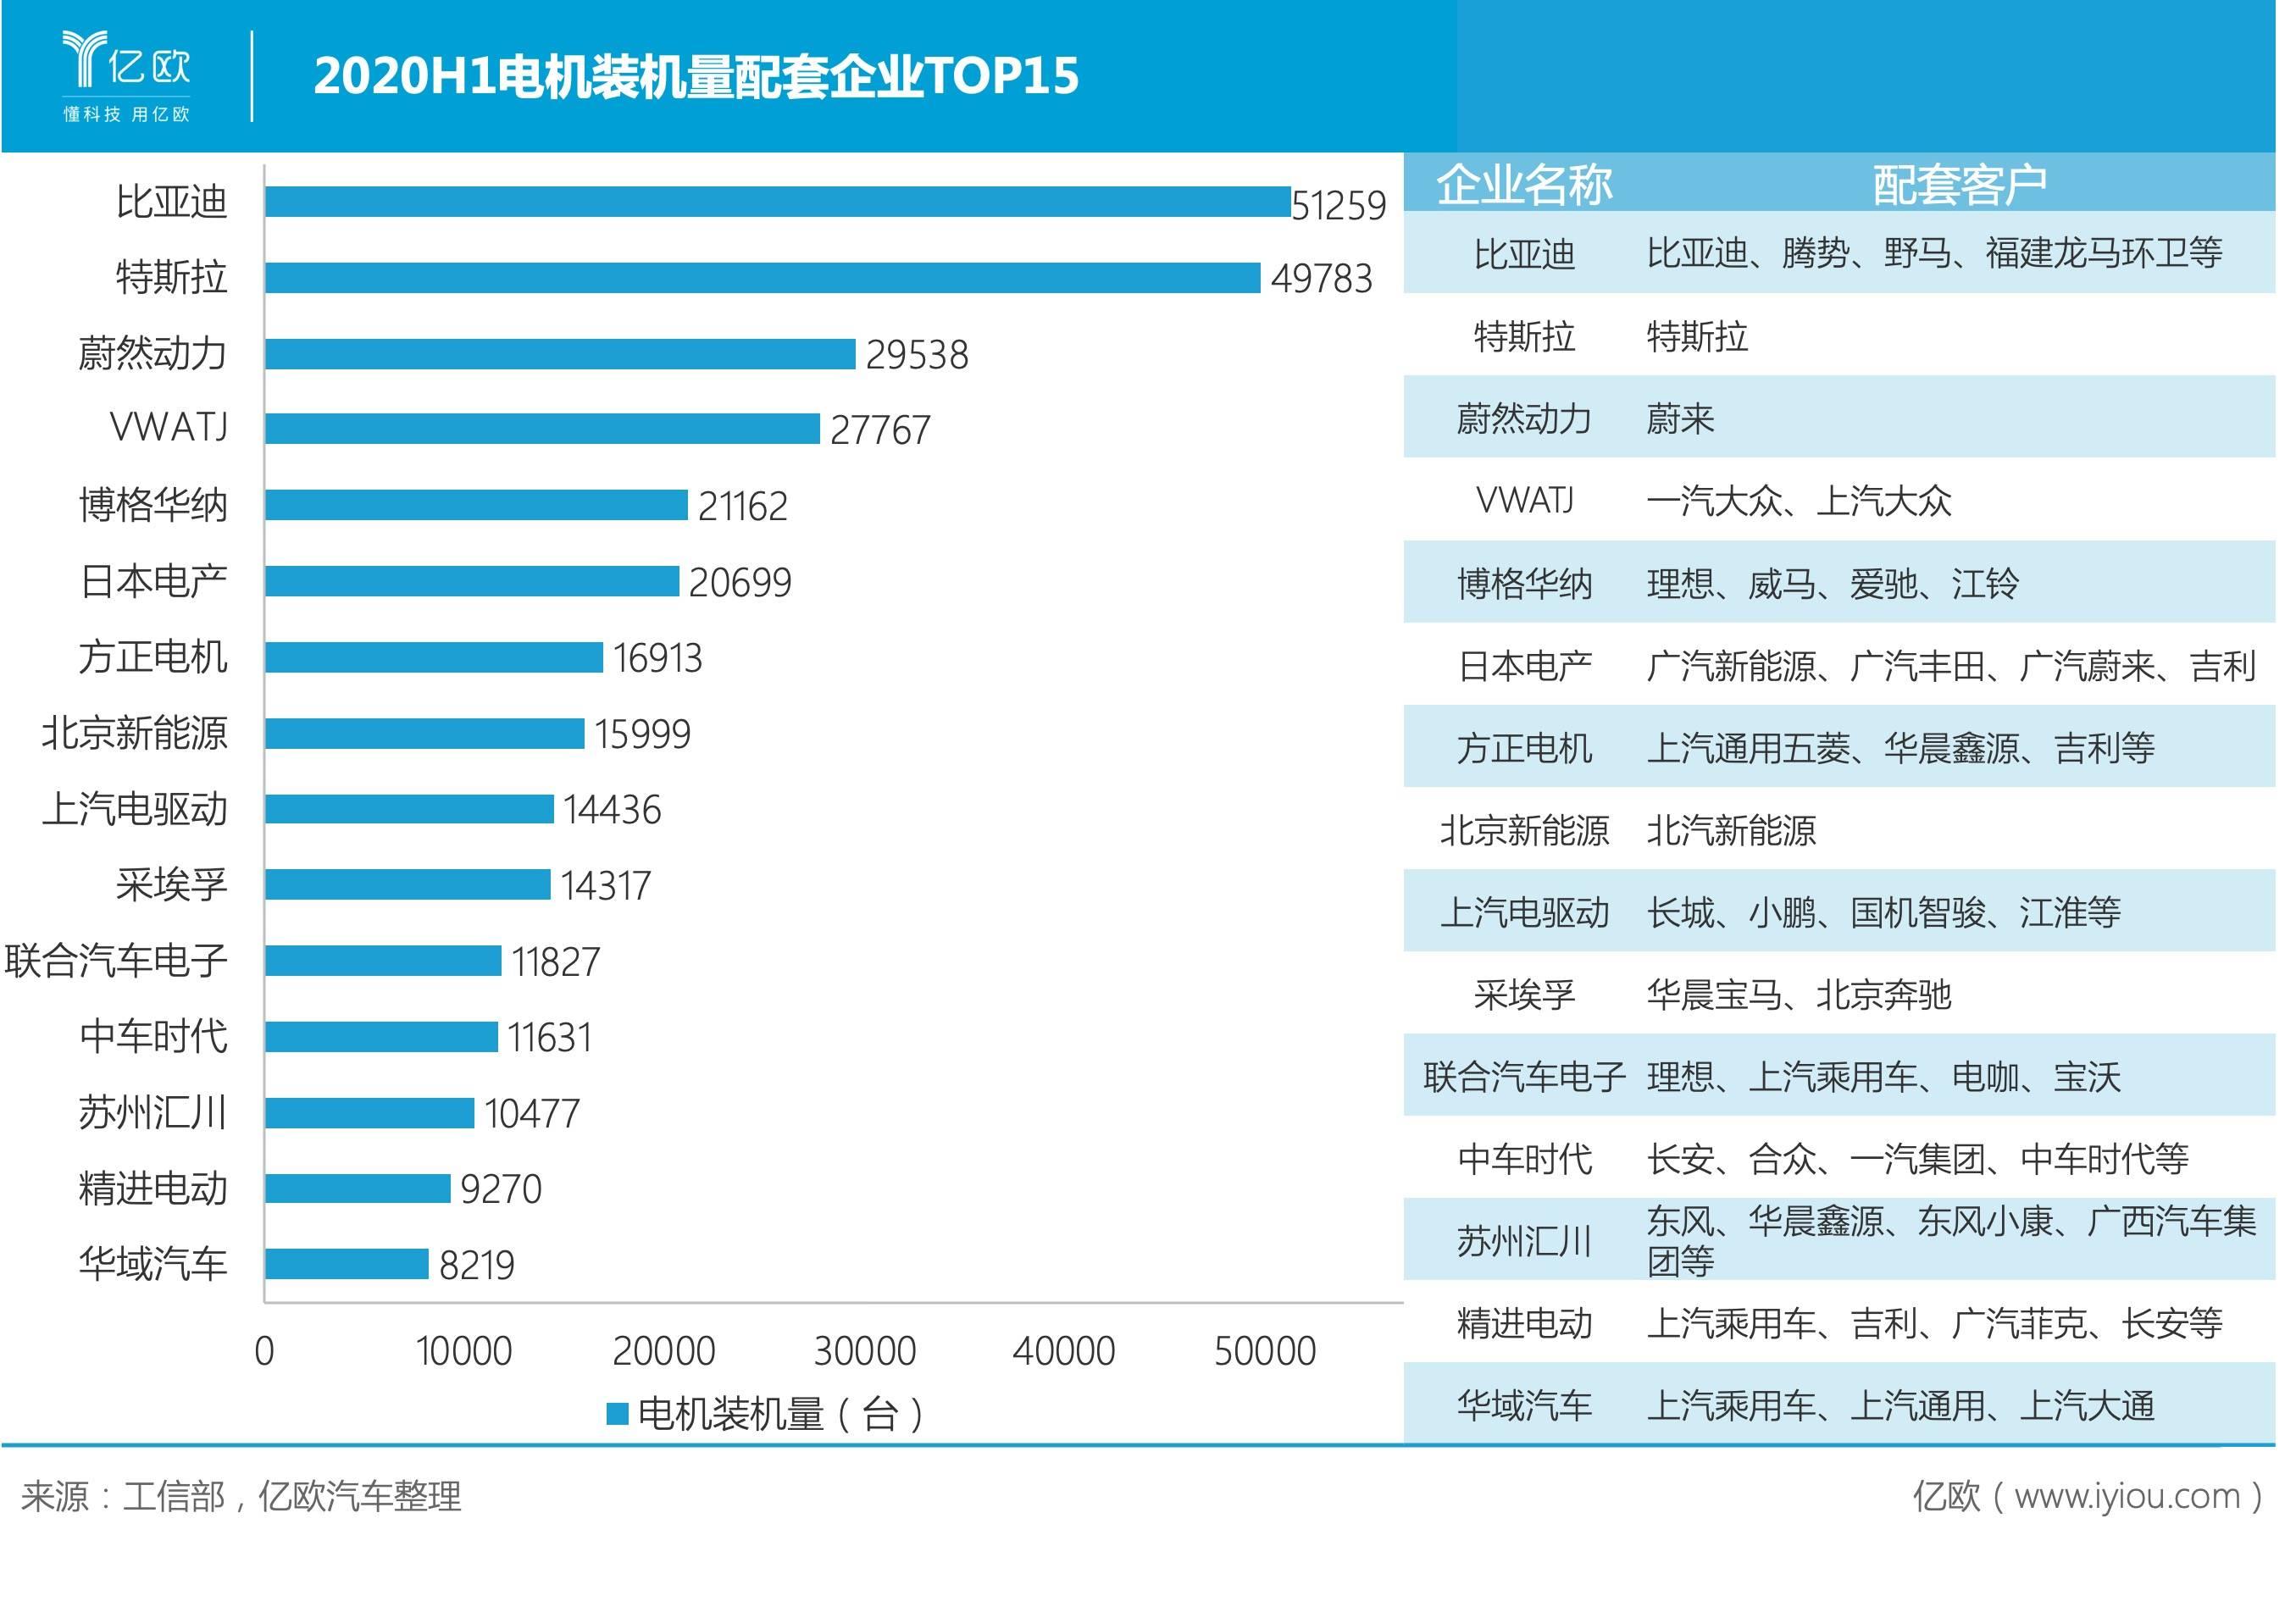 2020H1电机装机量配套企业TOP15